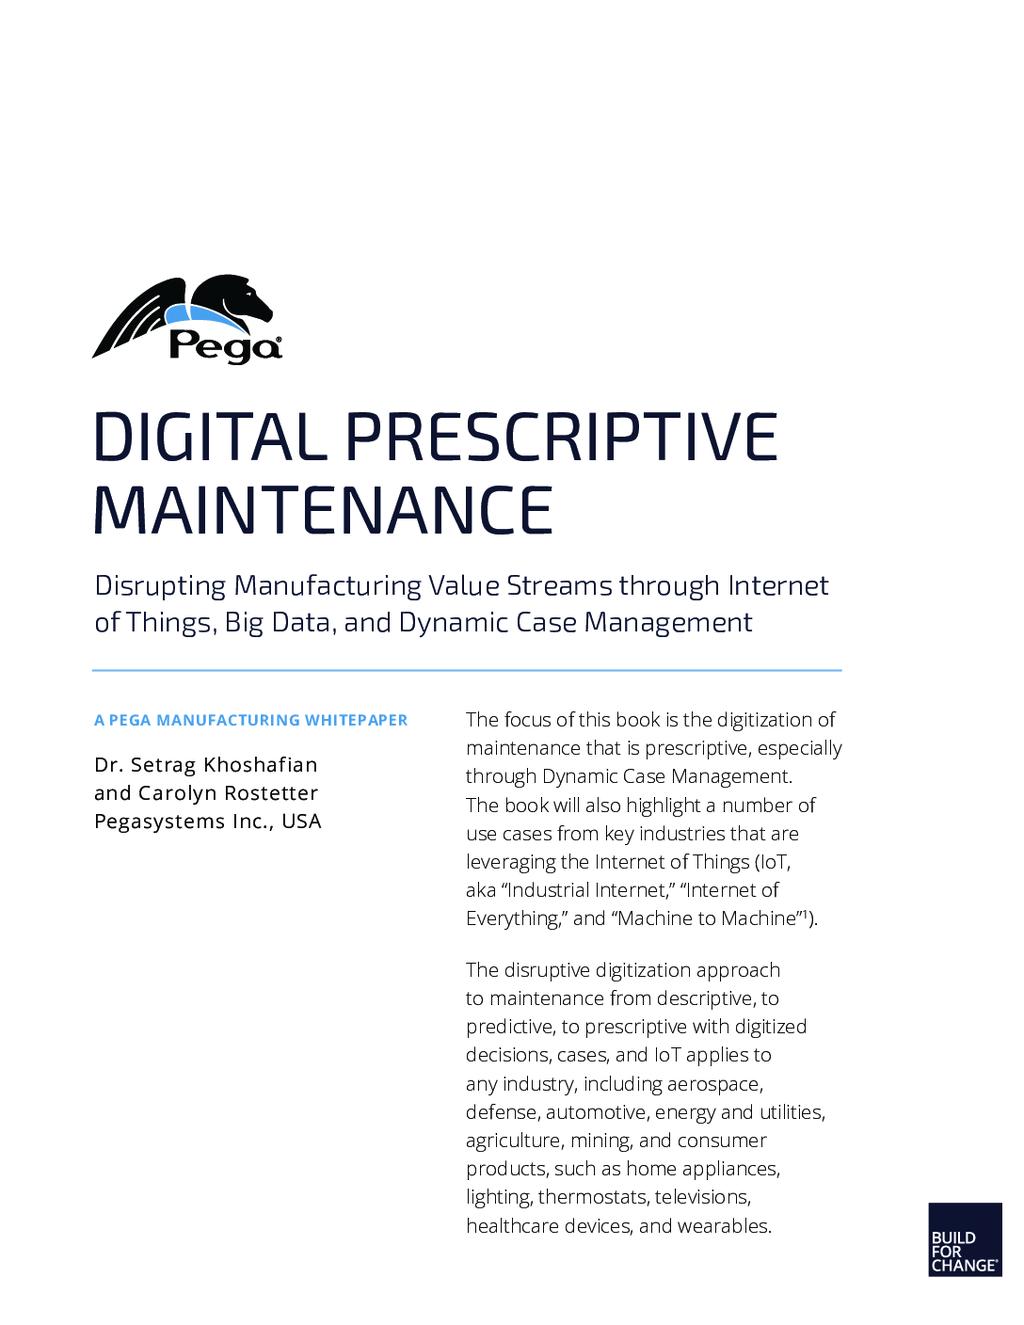 Prescriptive Maintenance Digital